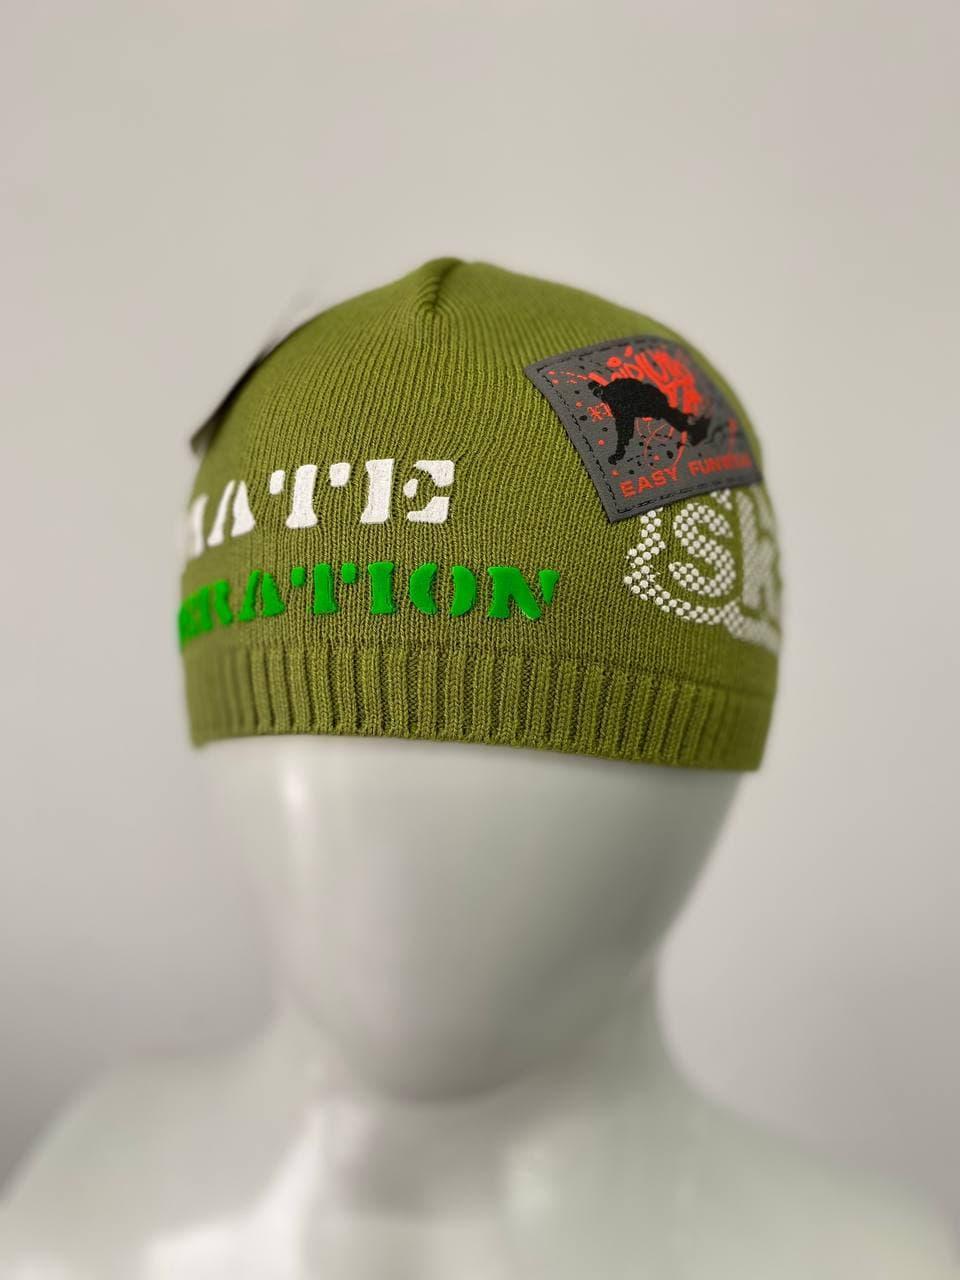 Детская вязаная шапочка Inside 2604 хаки